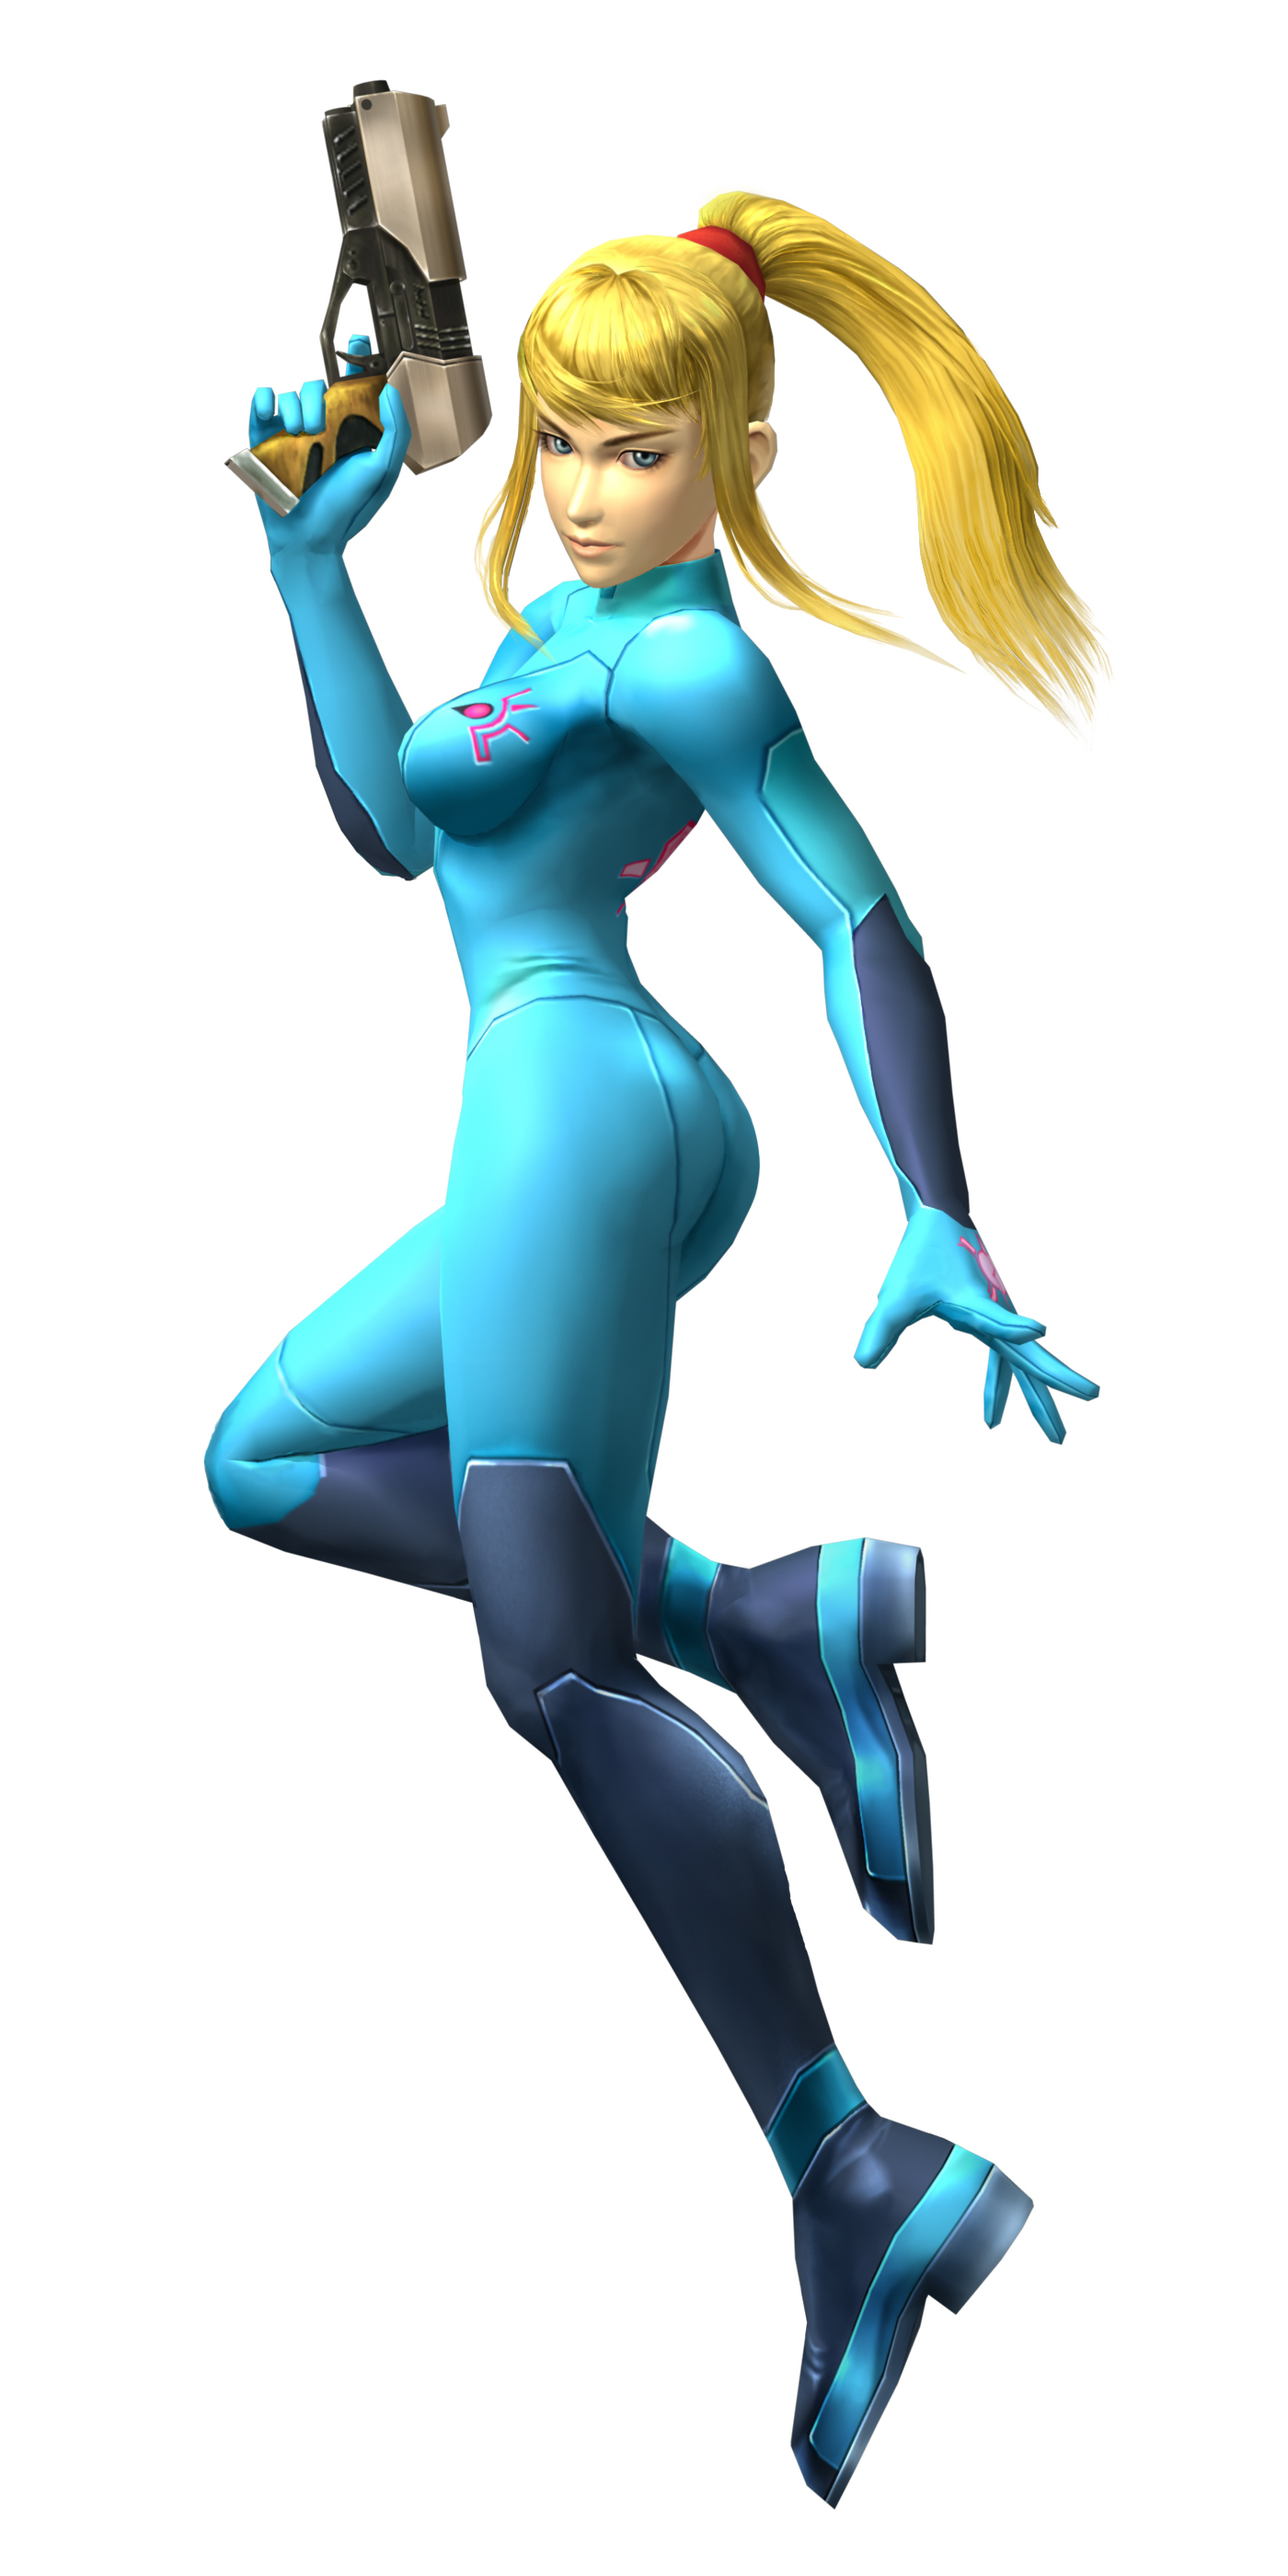 Artwork and renders - Super Smash Bros. Brawl (Metroid Recon)